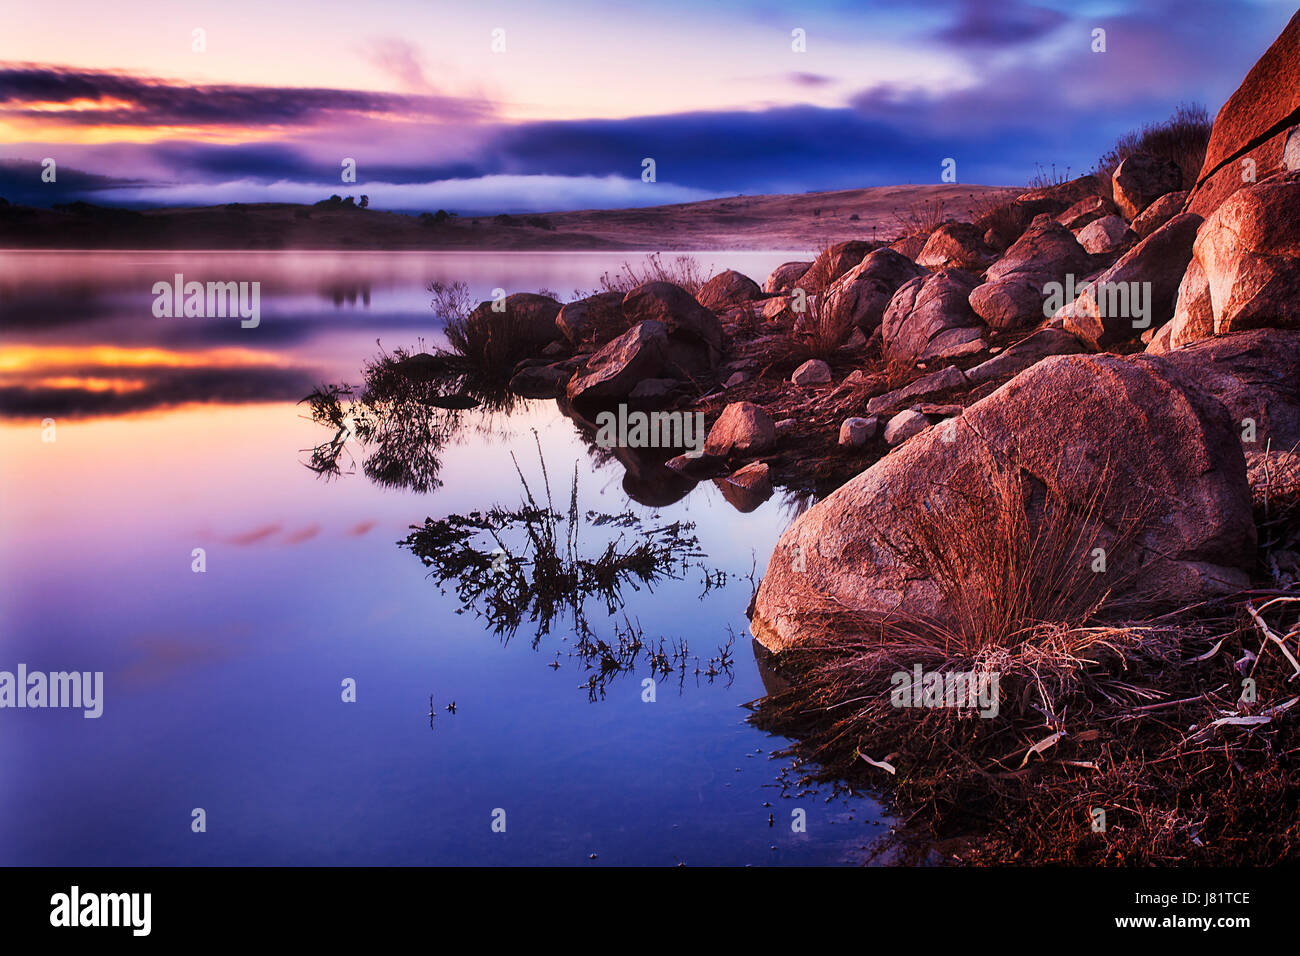 Colourful sunrise on Jindabyne lake in Snowy mountains region of NSW, Australia. Sandstone rocks and boulders on - Stock Image